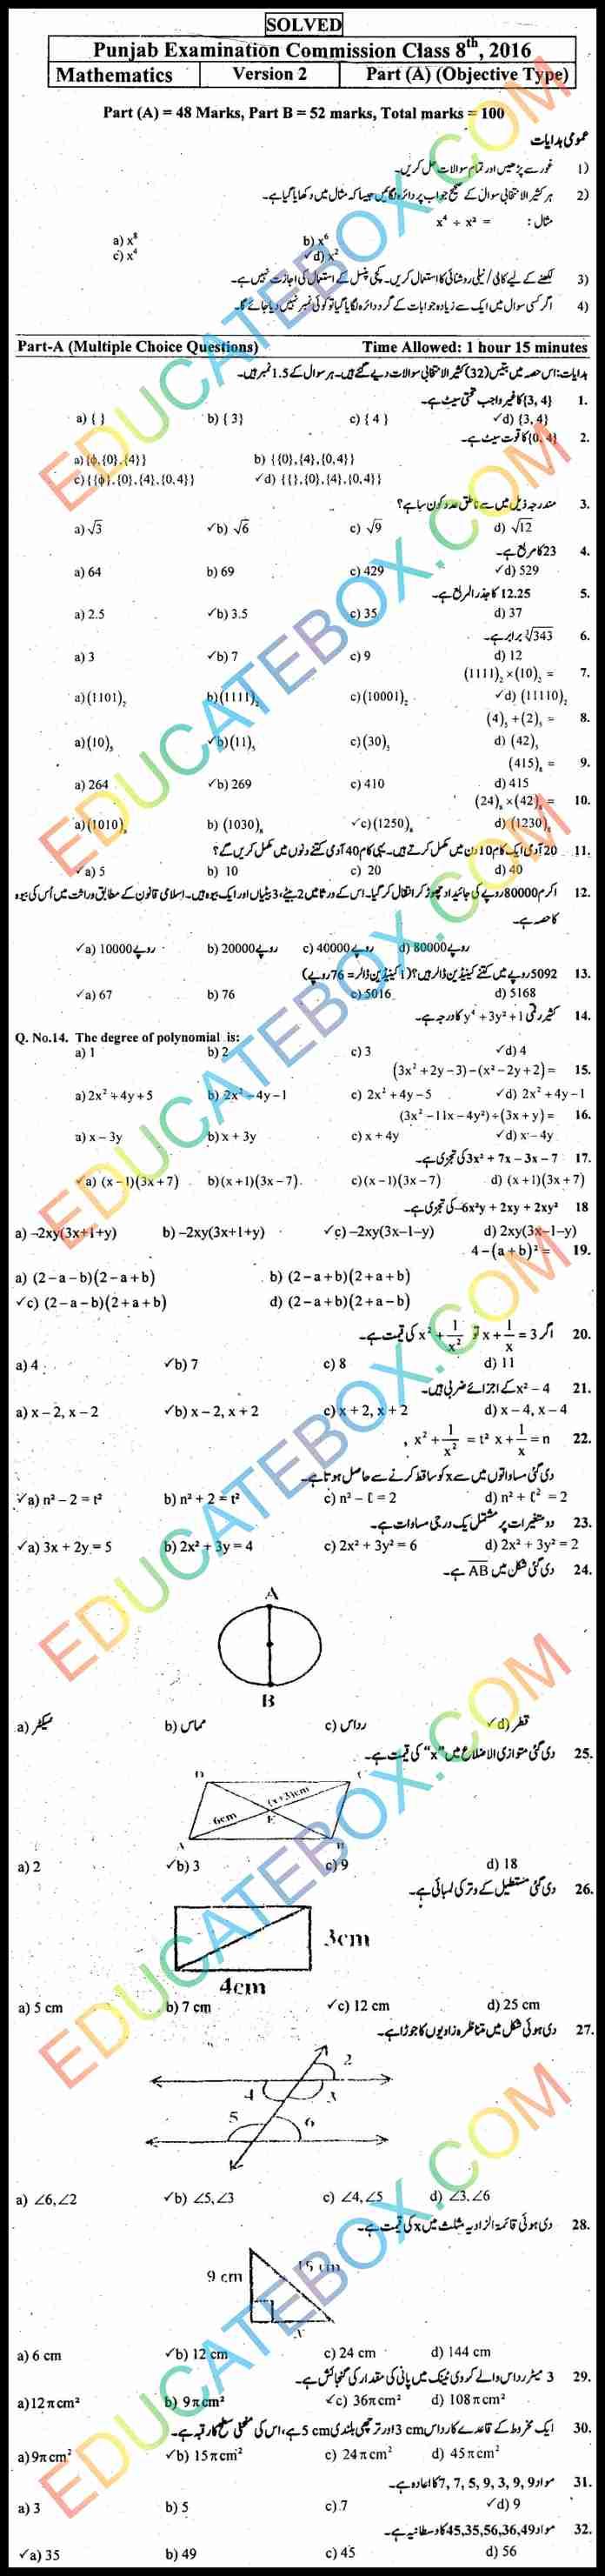 Past Paper 8th Class Maths 2016 Solved Paper Punjab Board (PEC) Objective Type Urdu Medium Version 2 اپ ٹو ڈیٹ پیپر ہشتم کلاس ریاضی حل شدہ پیپر پنجاب بورڈ اوبجیکٹیو ٹائپ اردو میڈیم ورزن 2